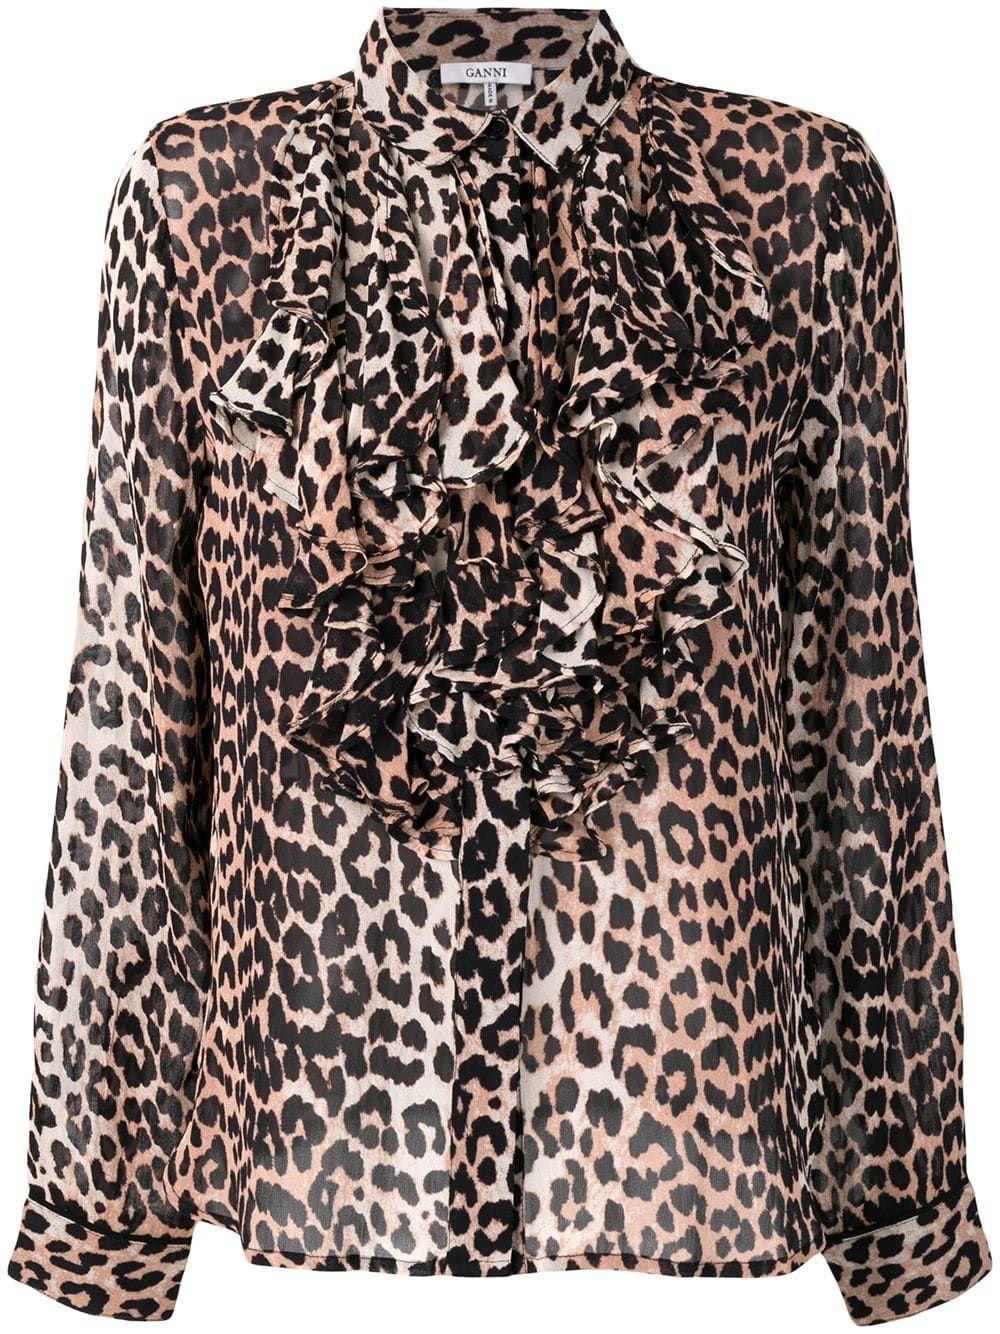 Ganni Leopard Print Shirt Farfetch Leopard Print Shirt Printed Shirts Leopard Print [ 1334 x 1000 Pixel ]